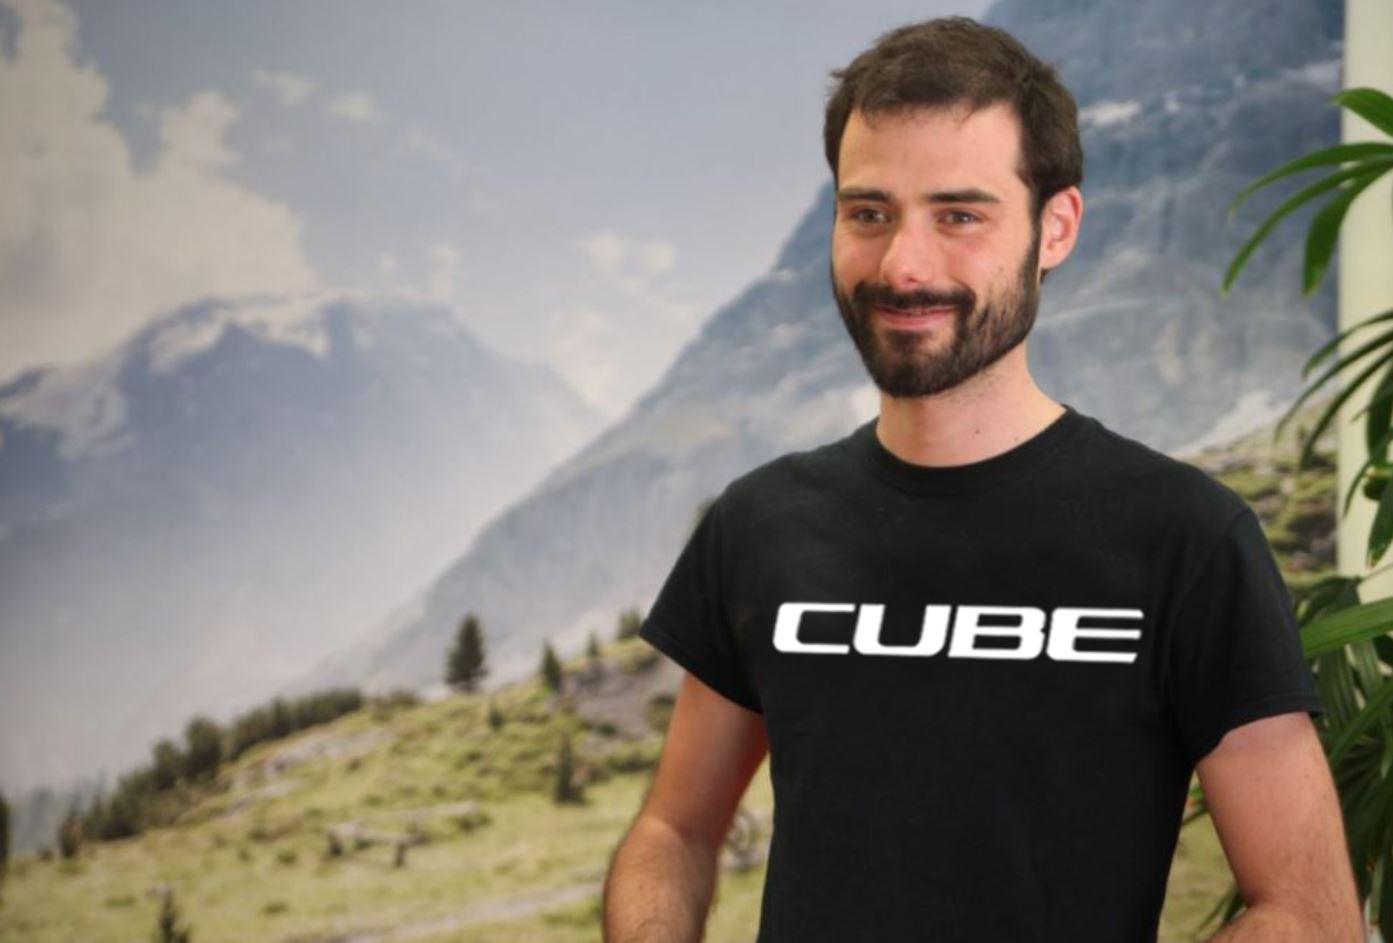 cube mattheus